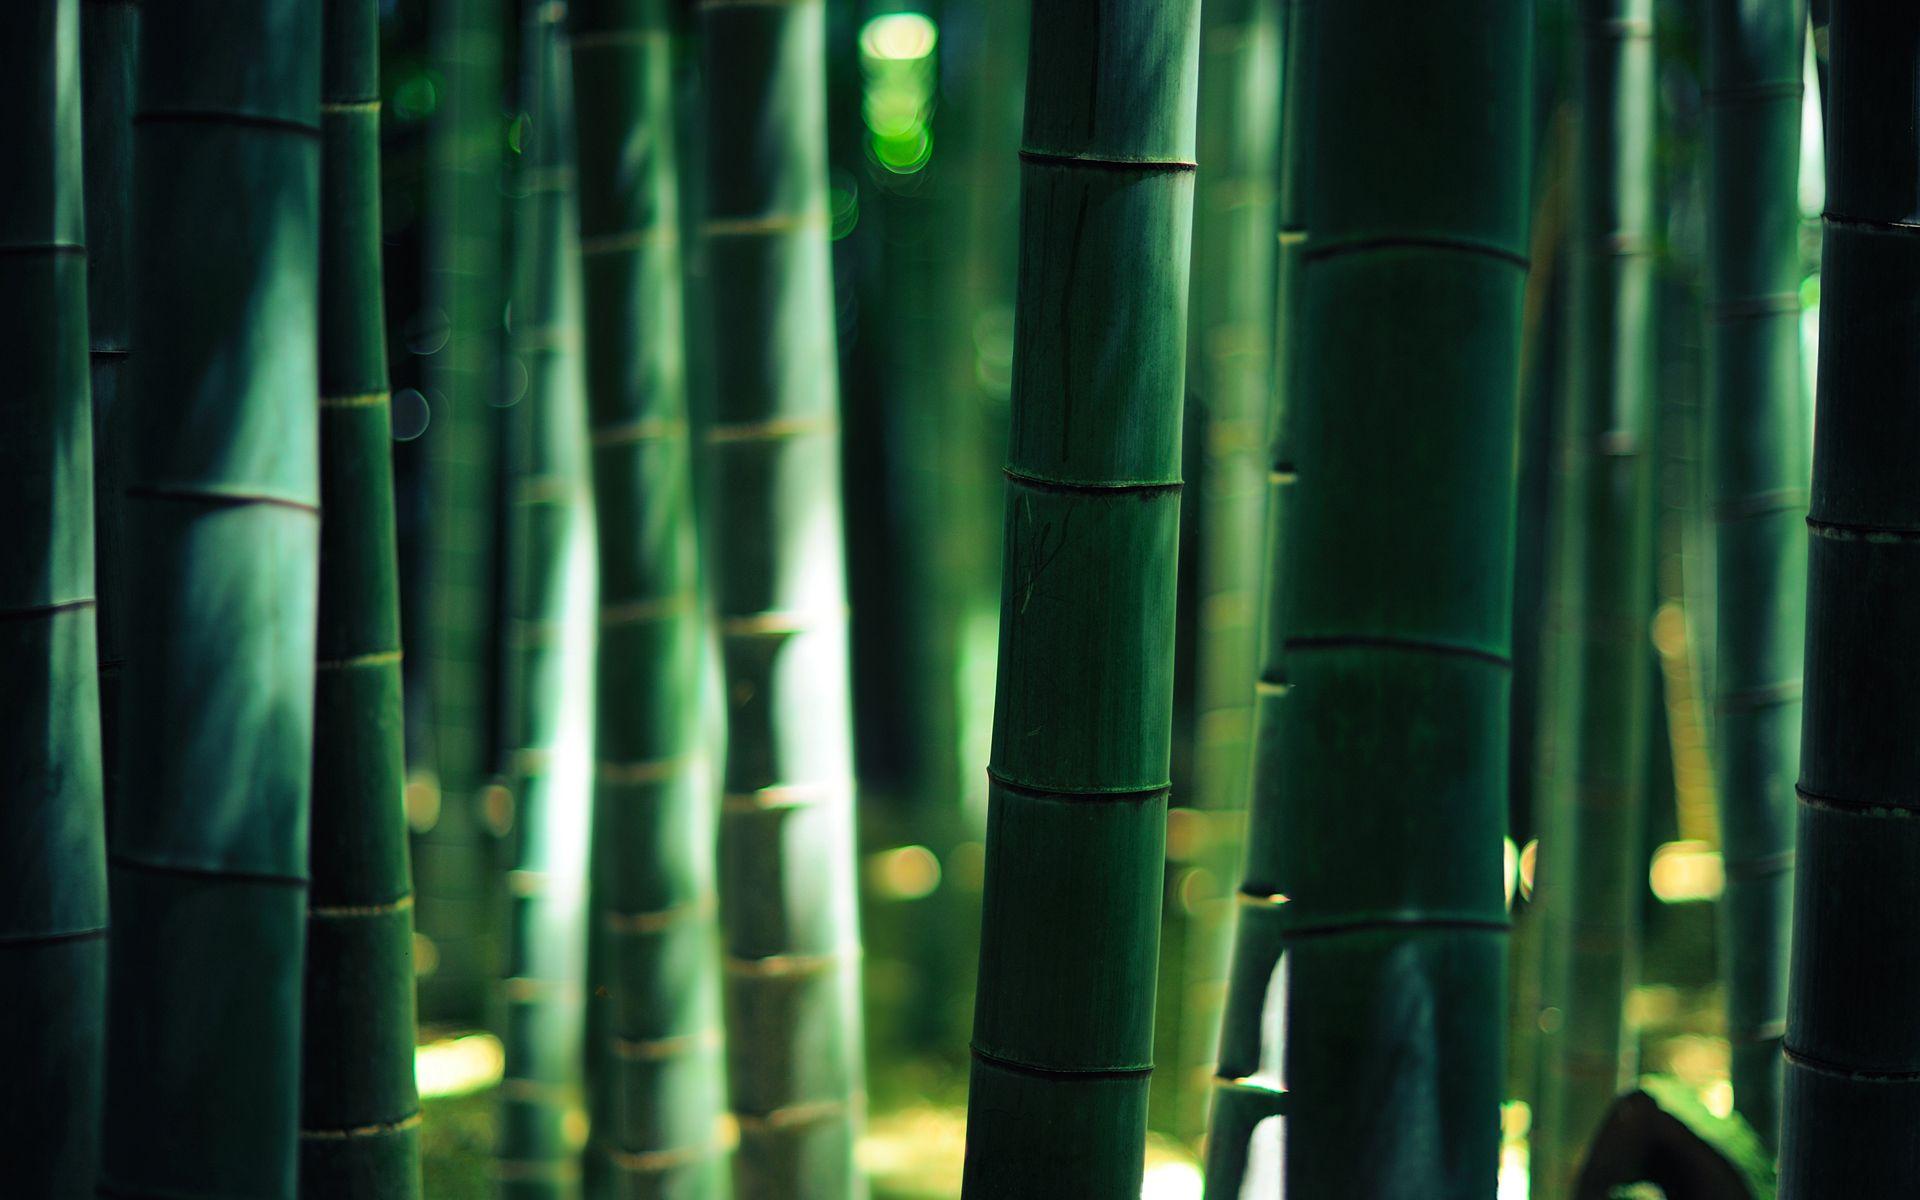 Notre Dame Fighting Irish Stadium Picture For Wallpaper Bamboo